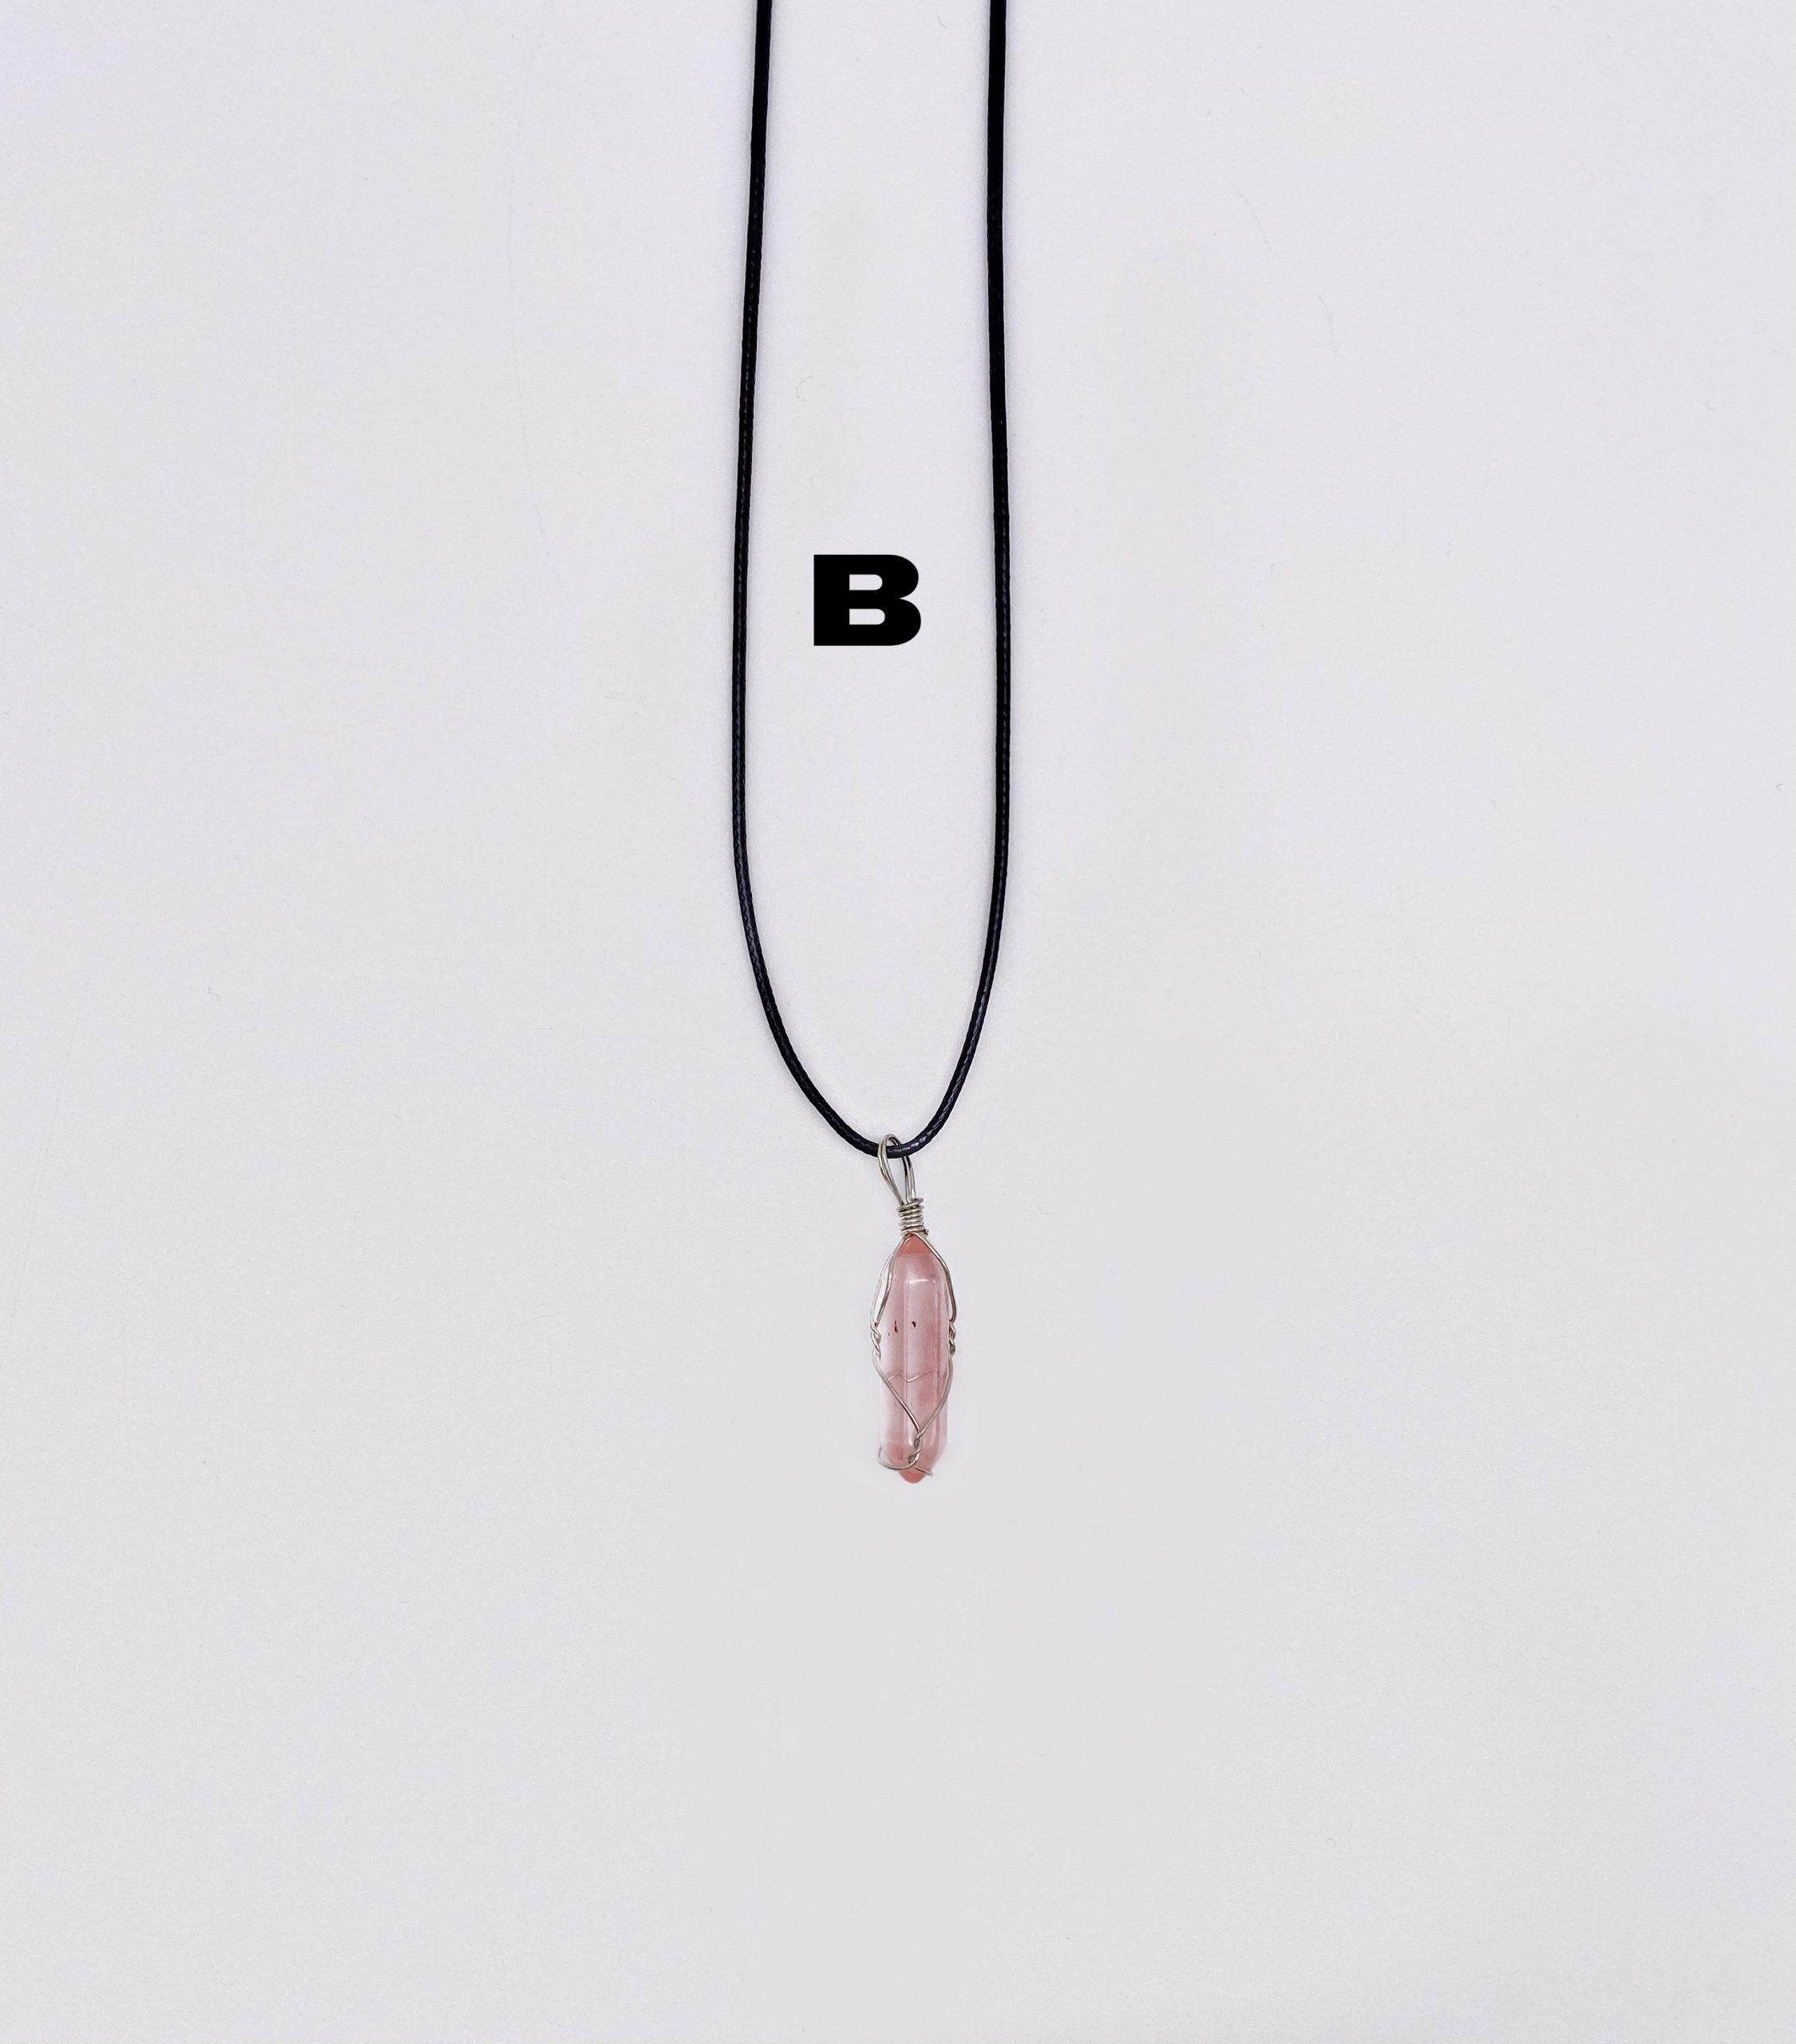 fire cherry quartz necklace; cherry quartz necklace; quartz necklace; copper tone glass bead necklace; quartz and glass bead necklace